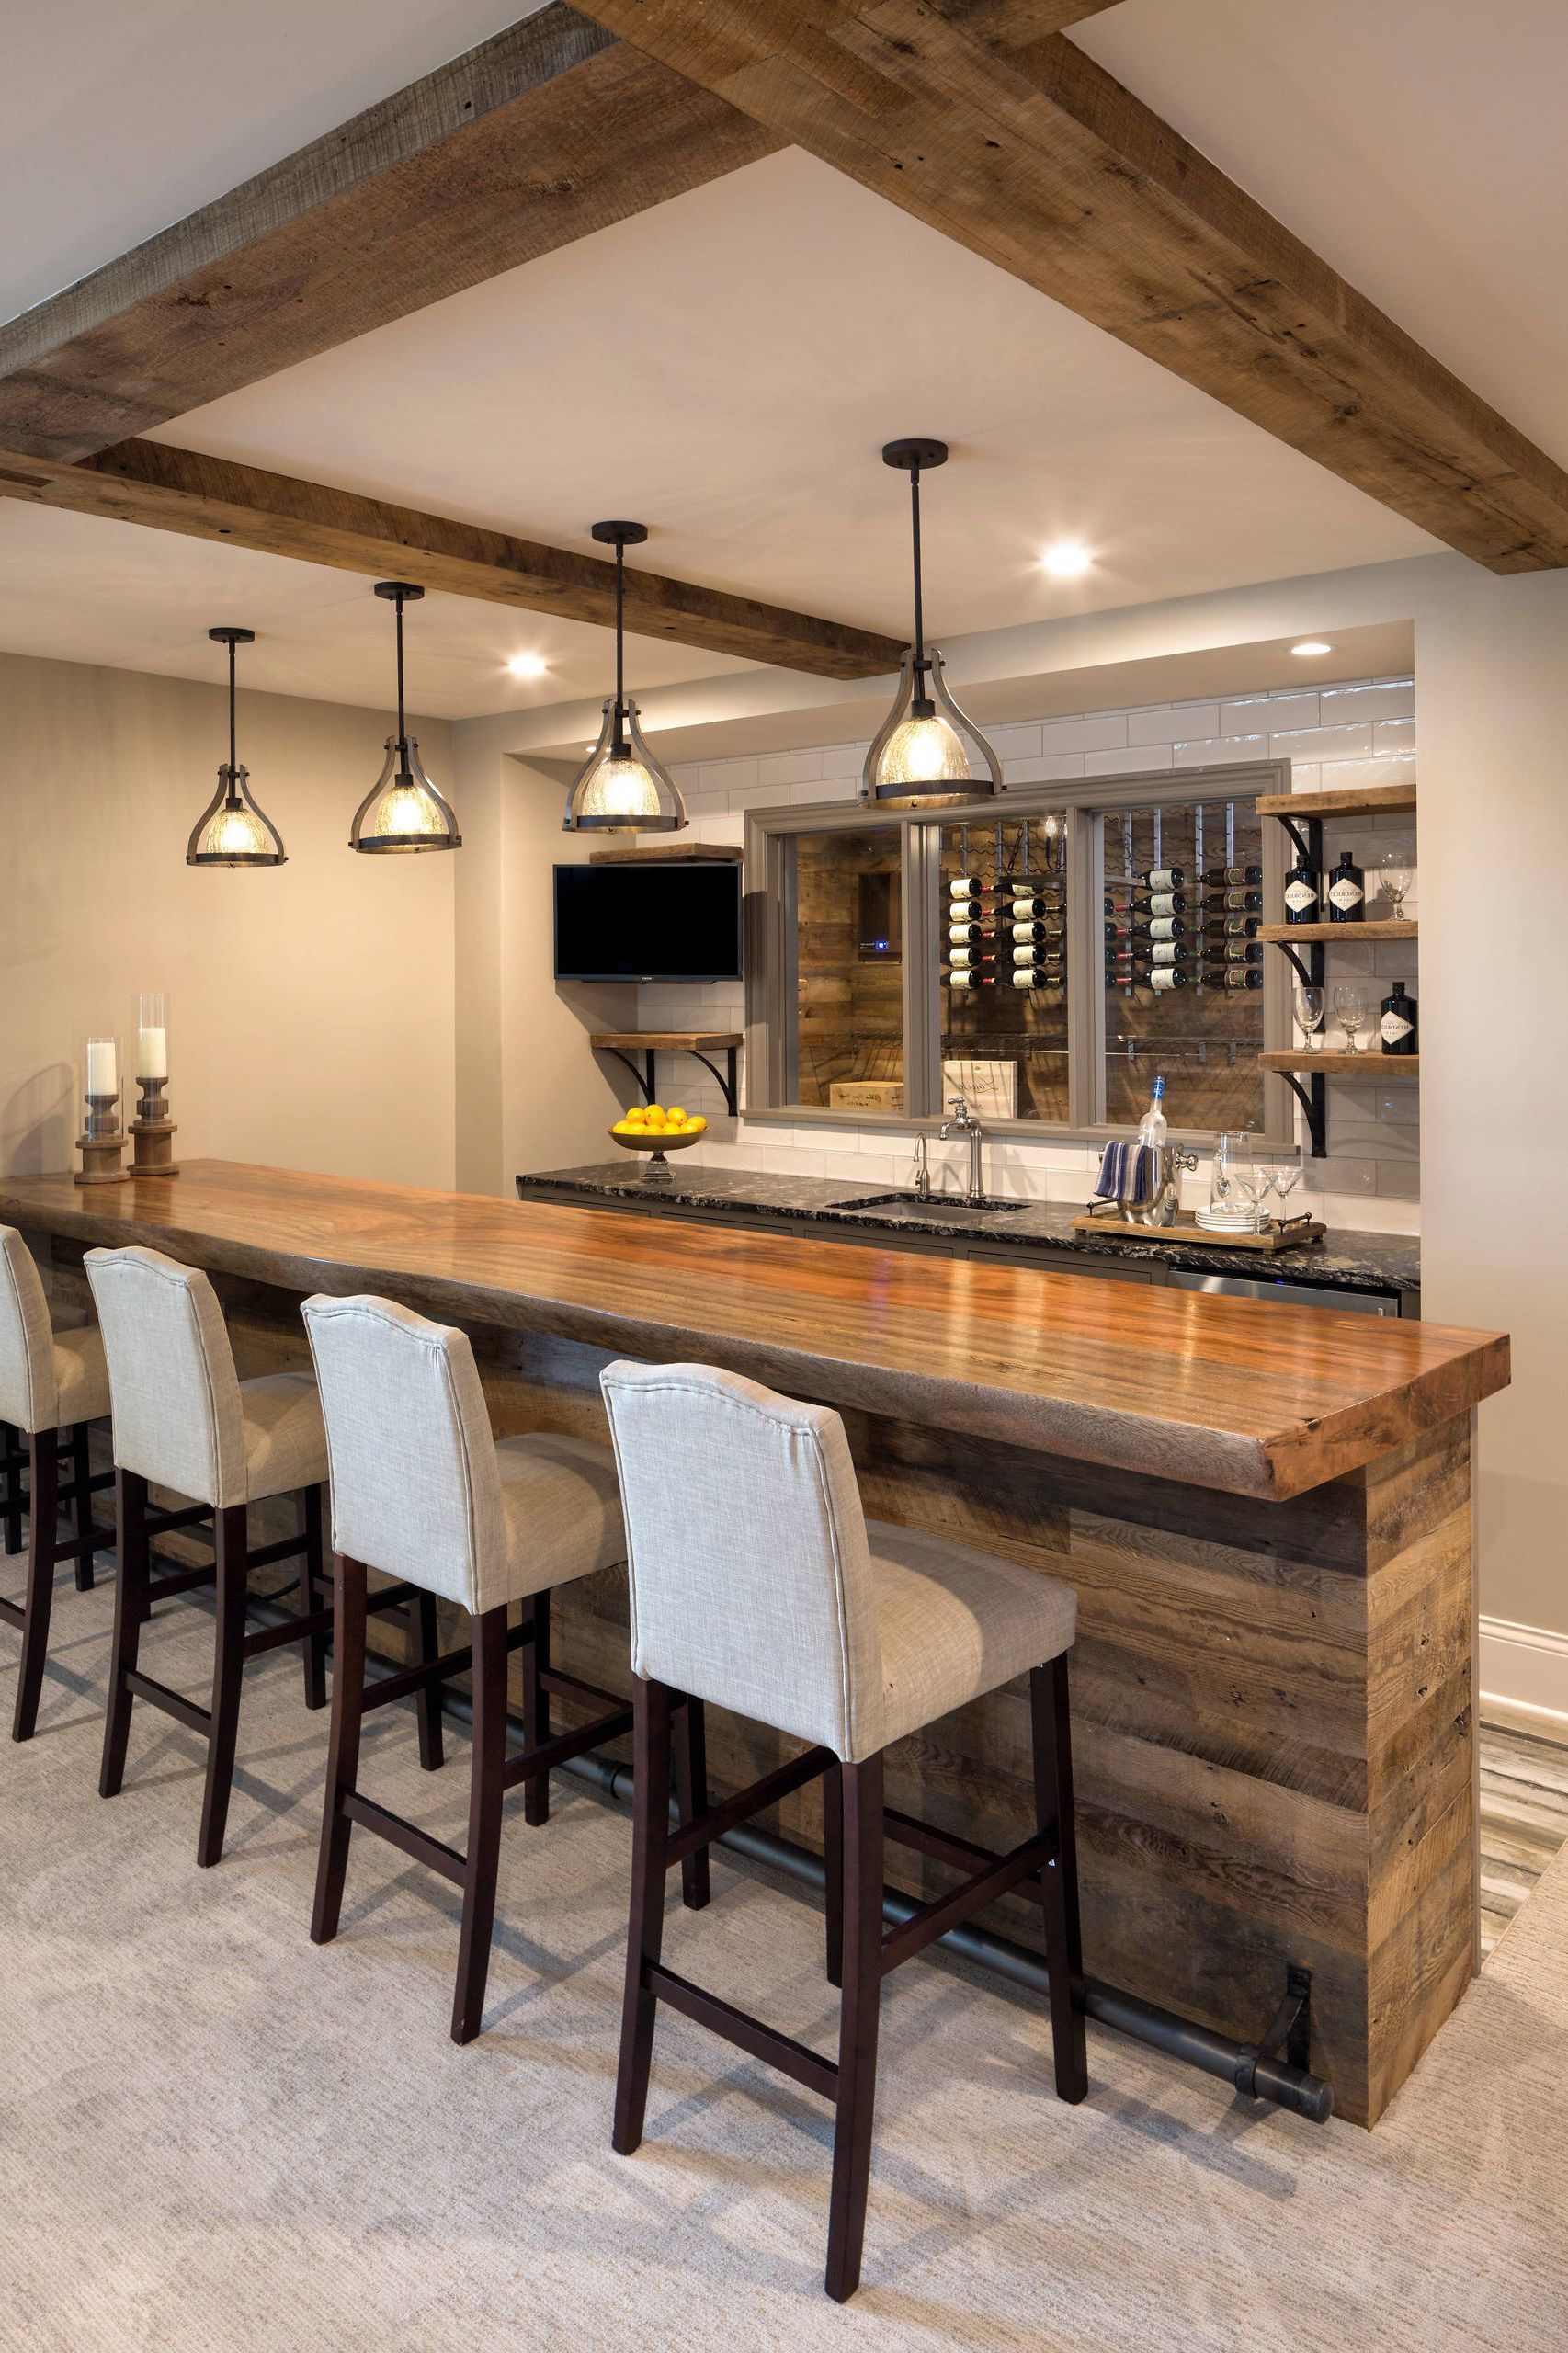 Home Bar Room Designs Decor Around The World Bar Room Design Home Bar Rooms Basement Bar Designs